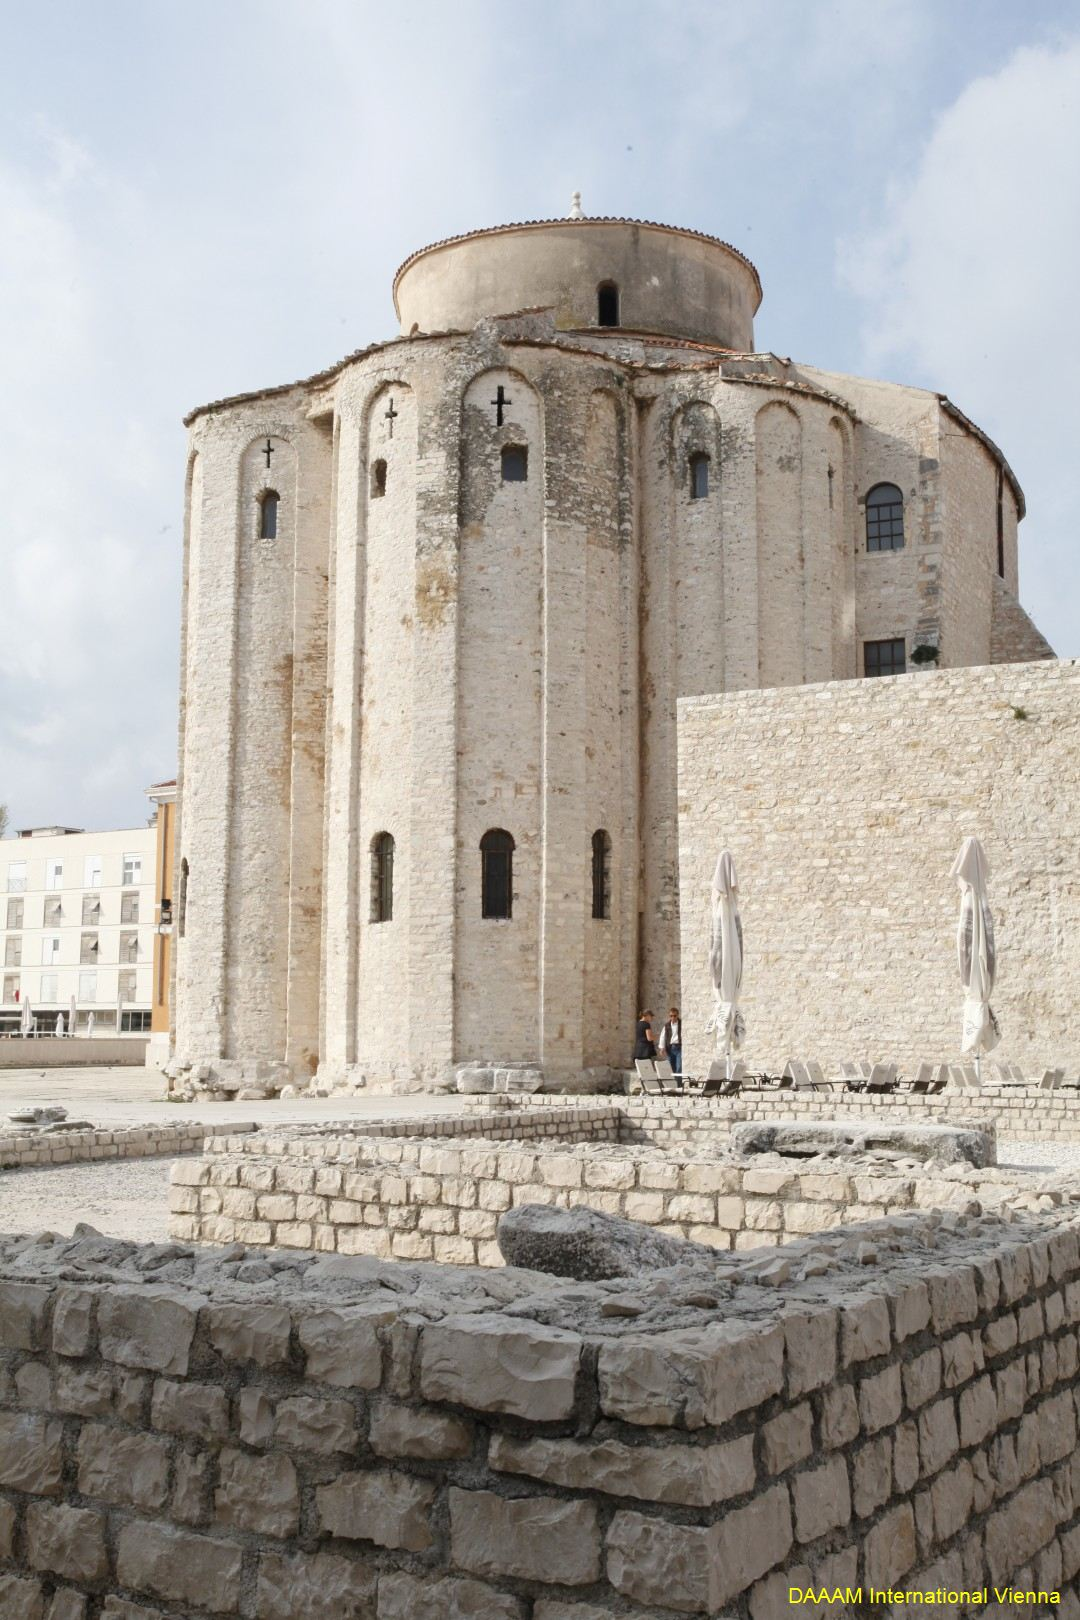 DAAAM_2012_Zadar_00_Zadar_City_065